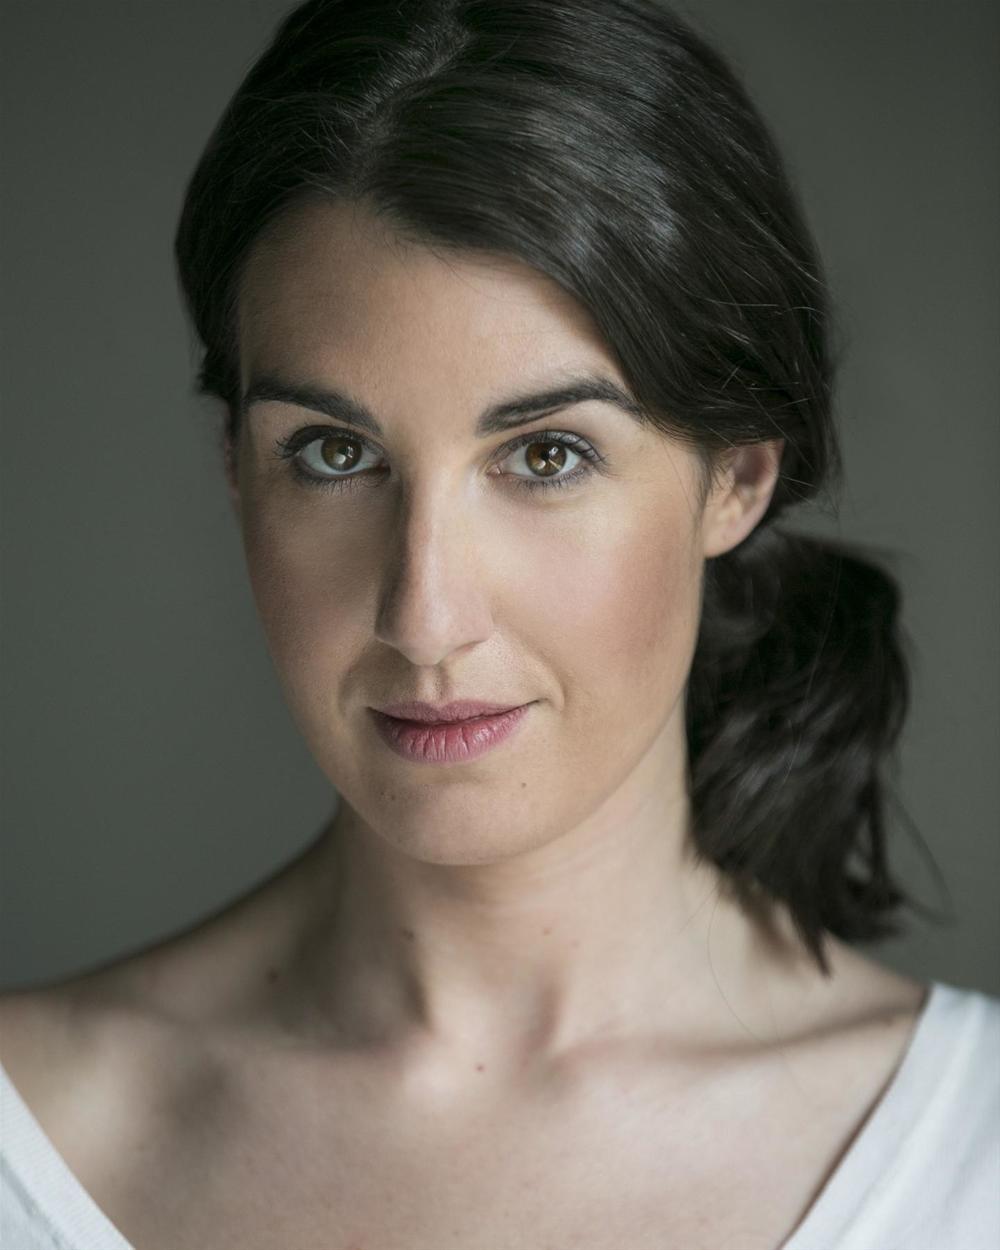 Lindsay Ashworth